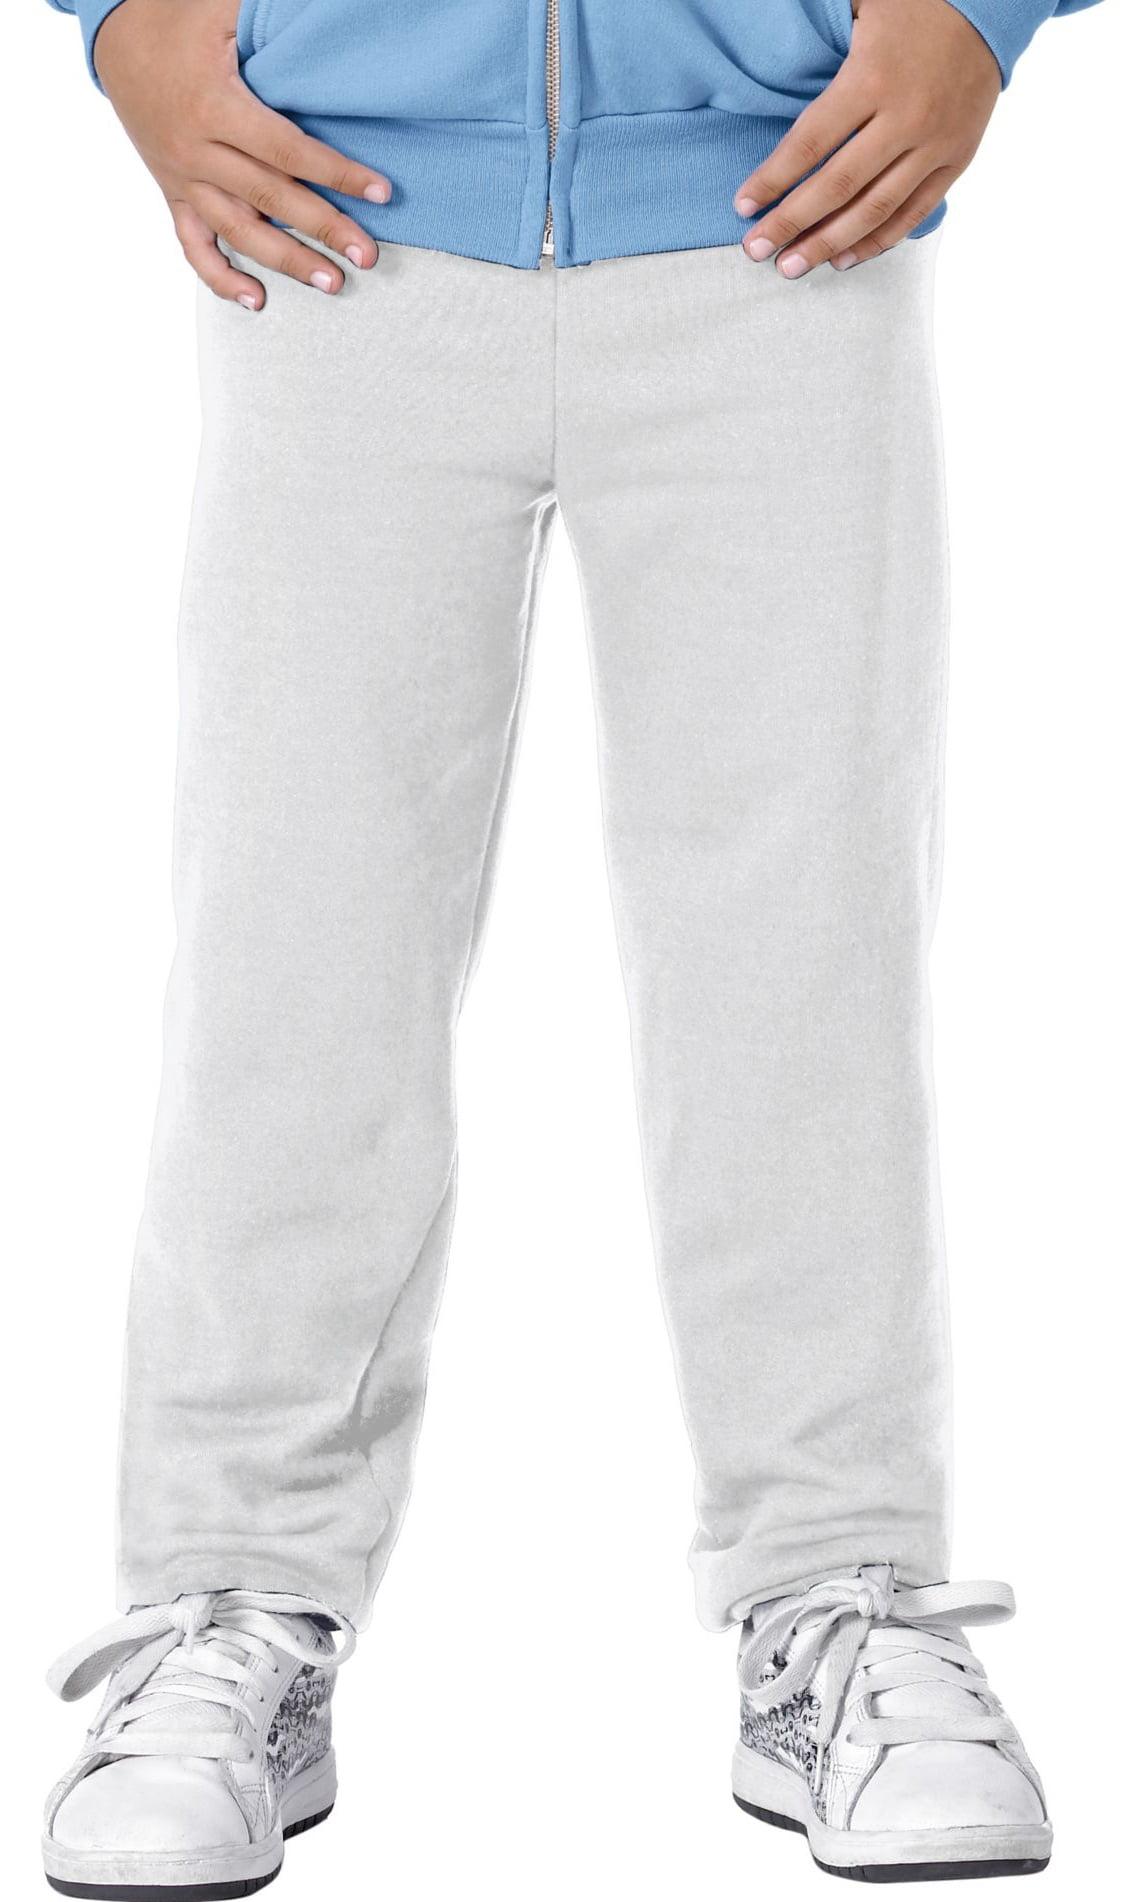 Hanes Youth ComfortBlend Fleece Sweatpant p450